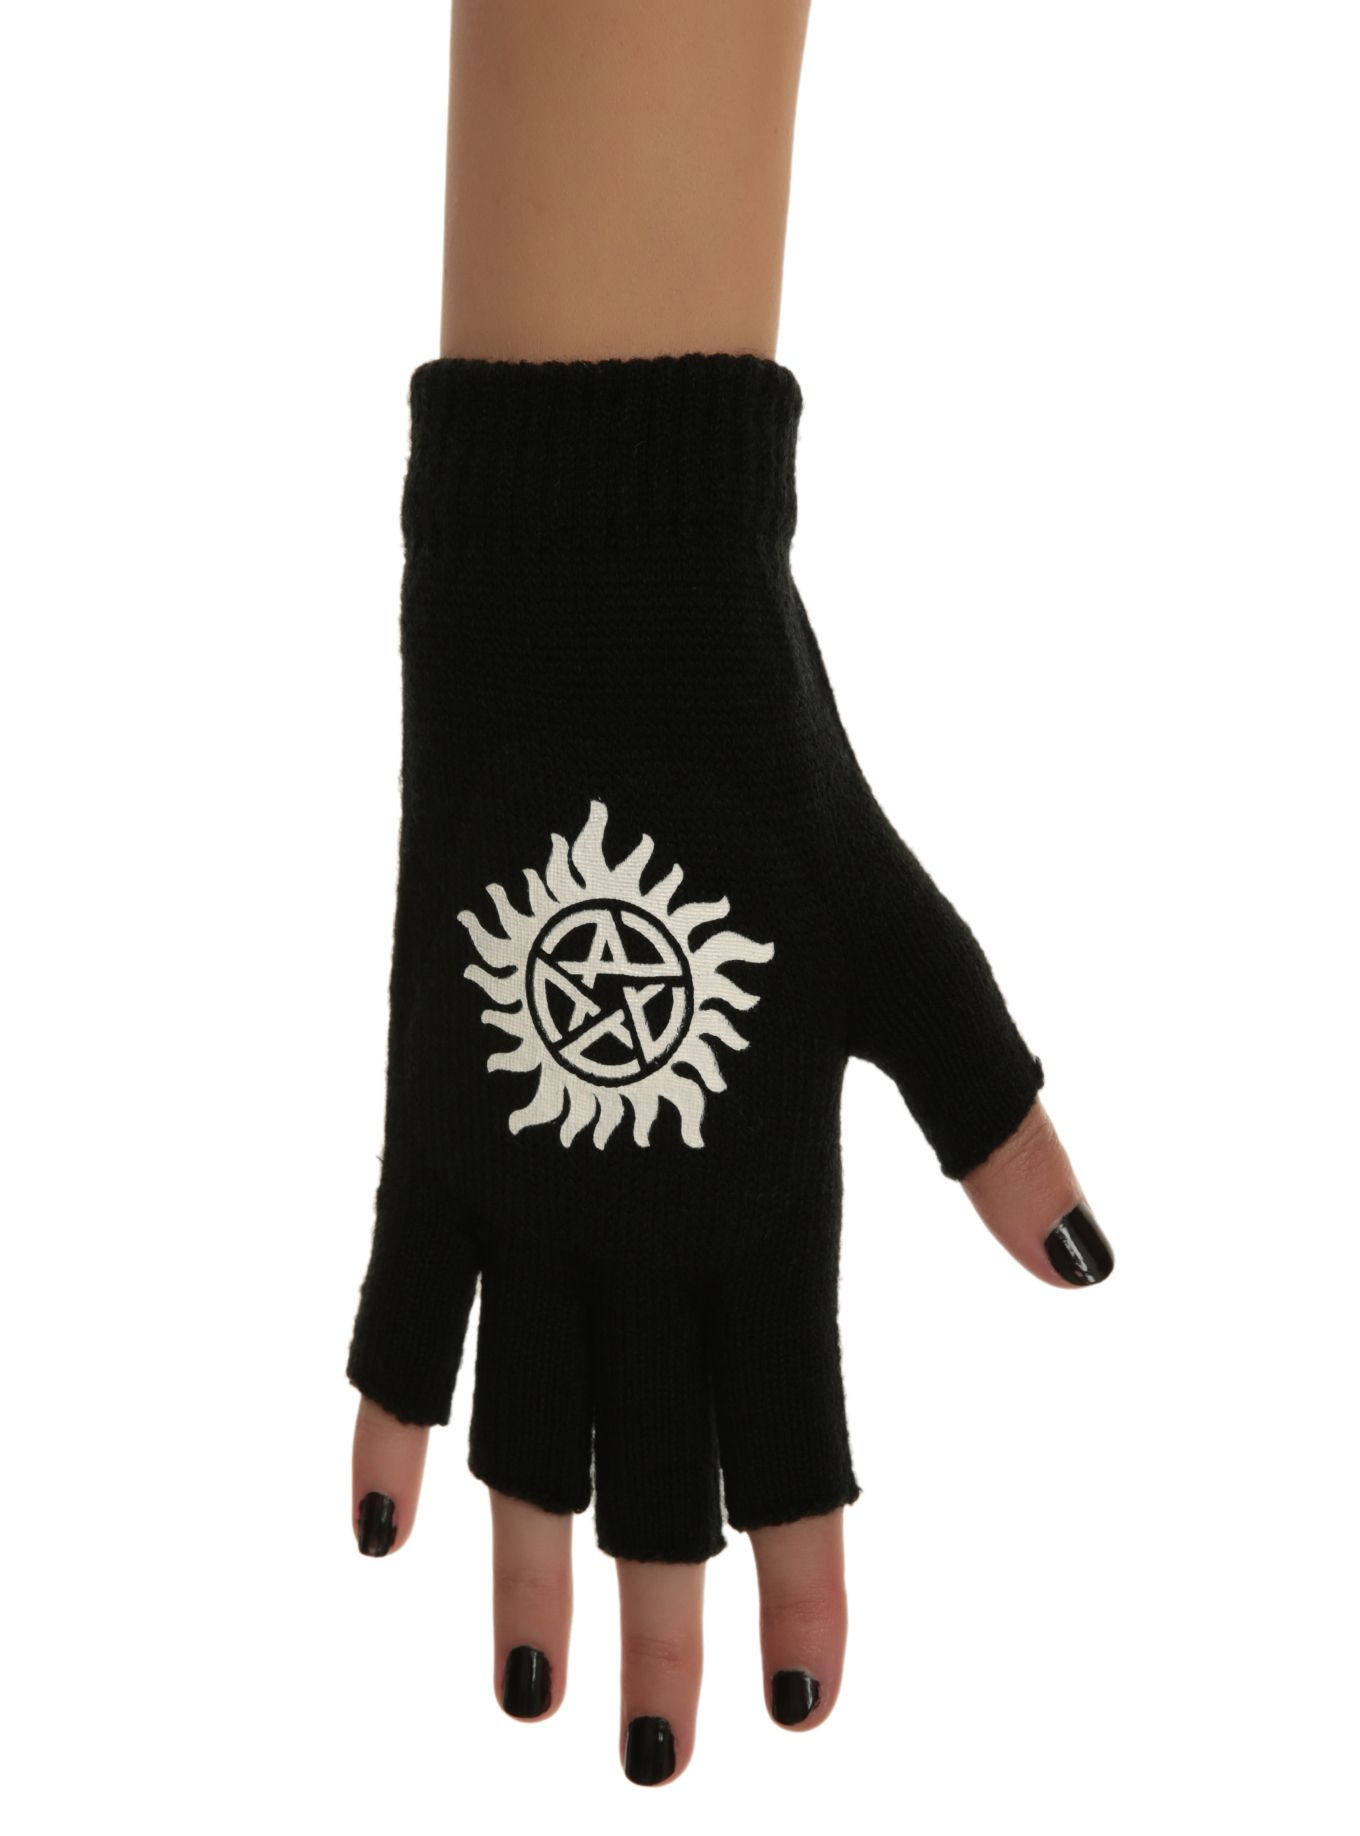 Supernatural Anti-Possession Symbol Fingerless Gloves | Hot Topic